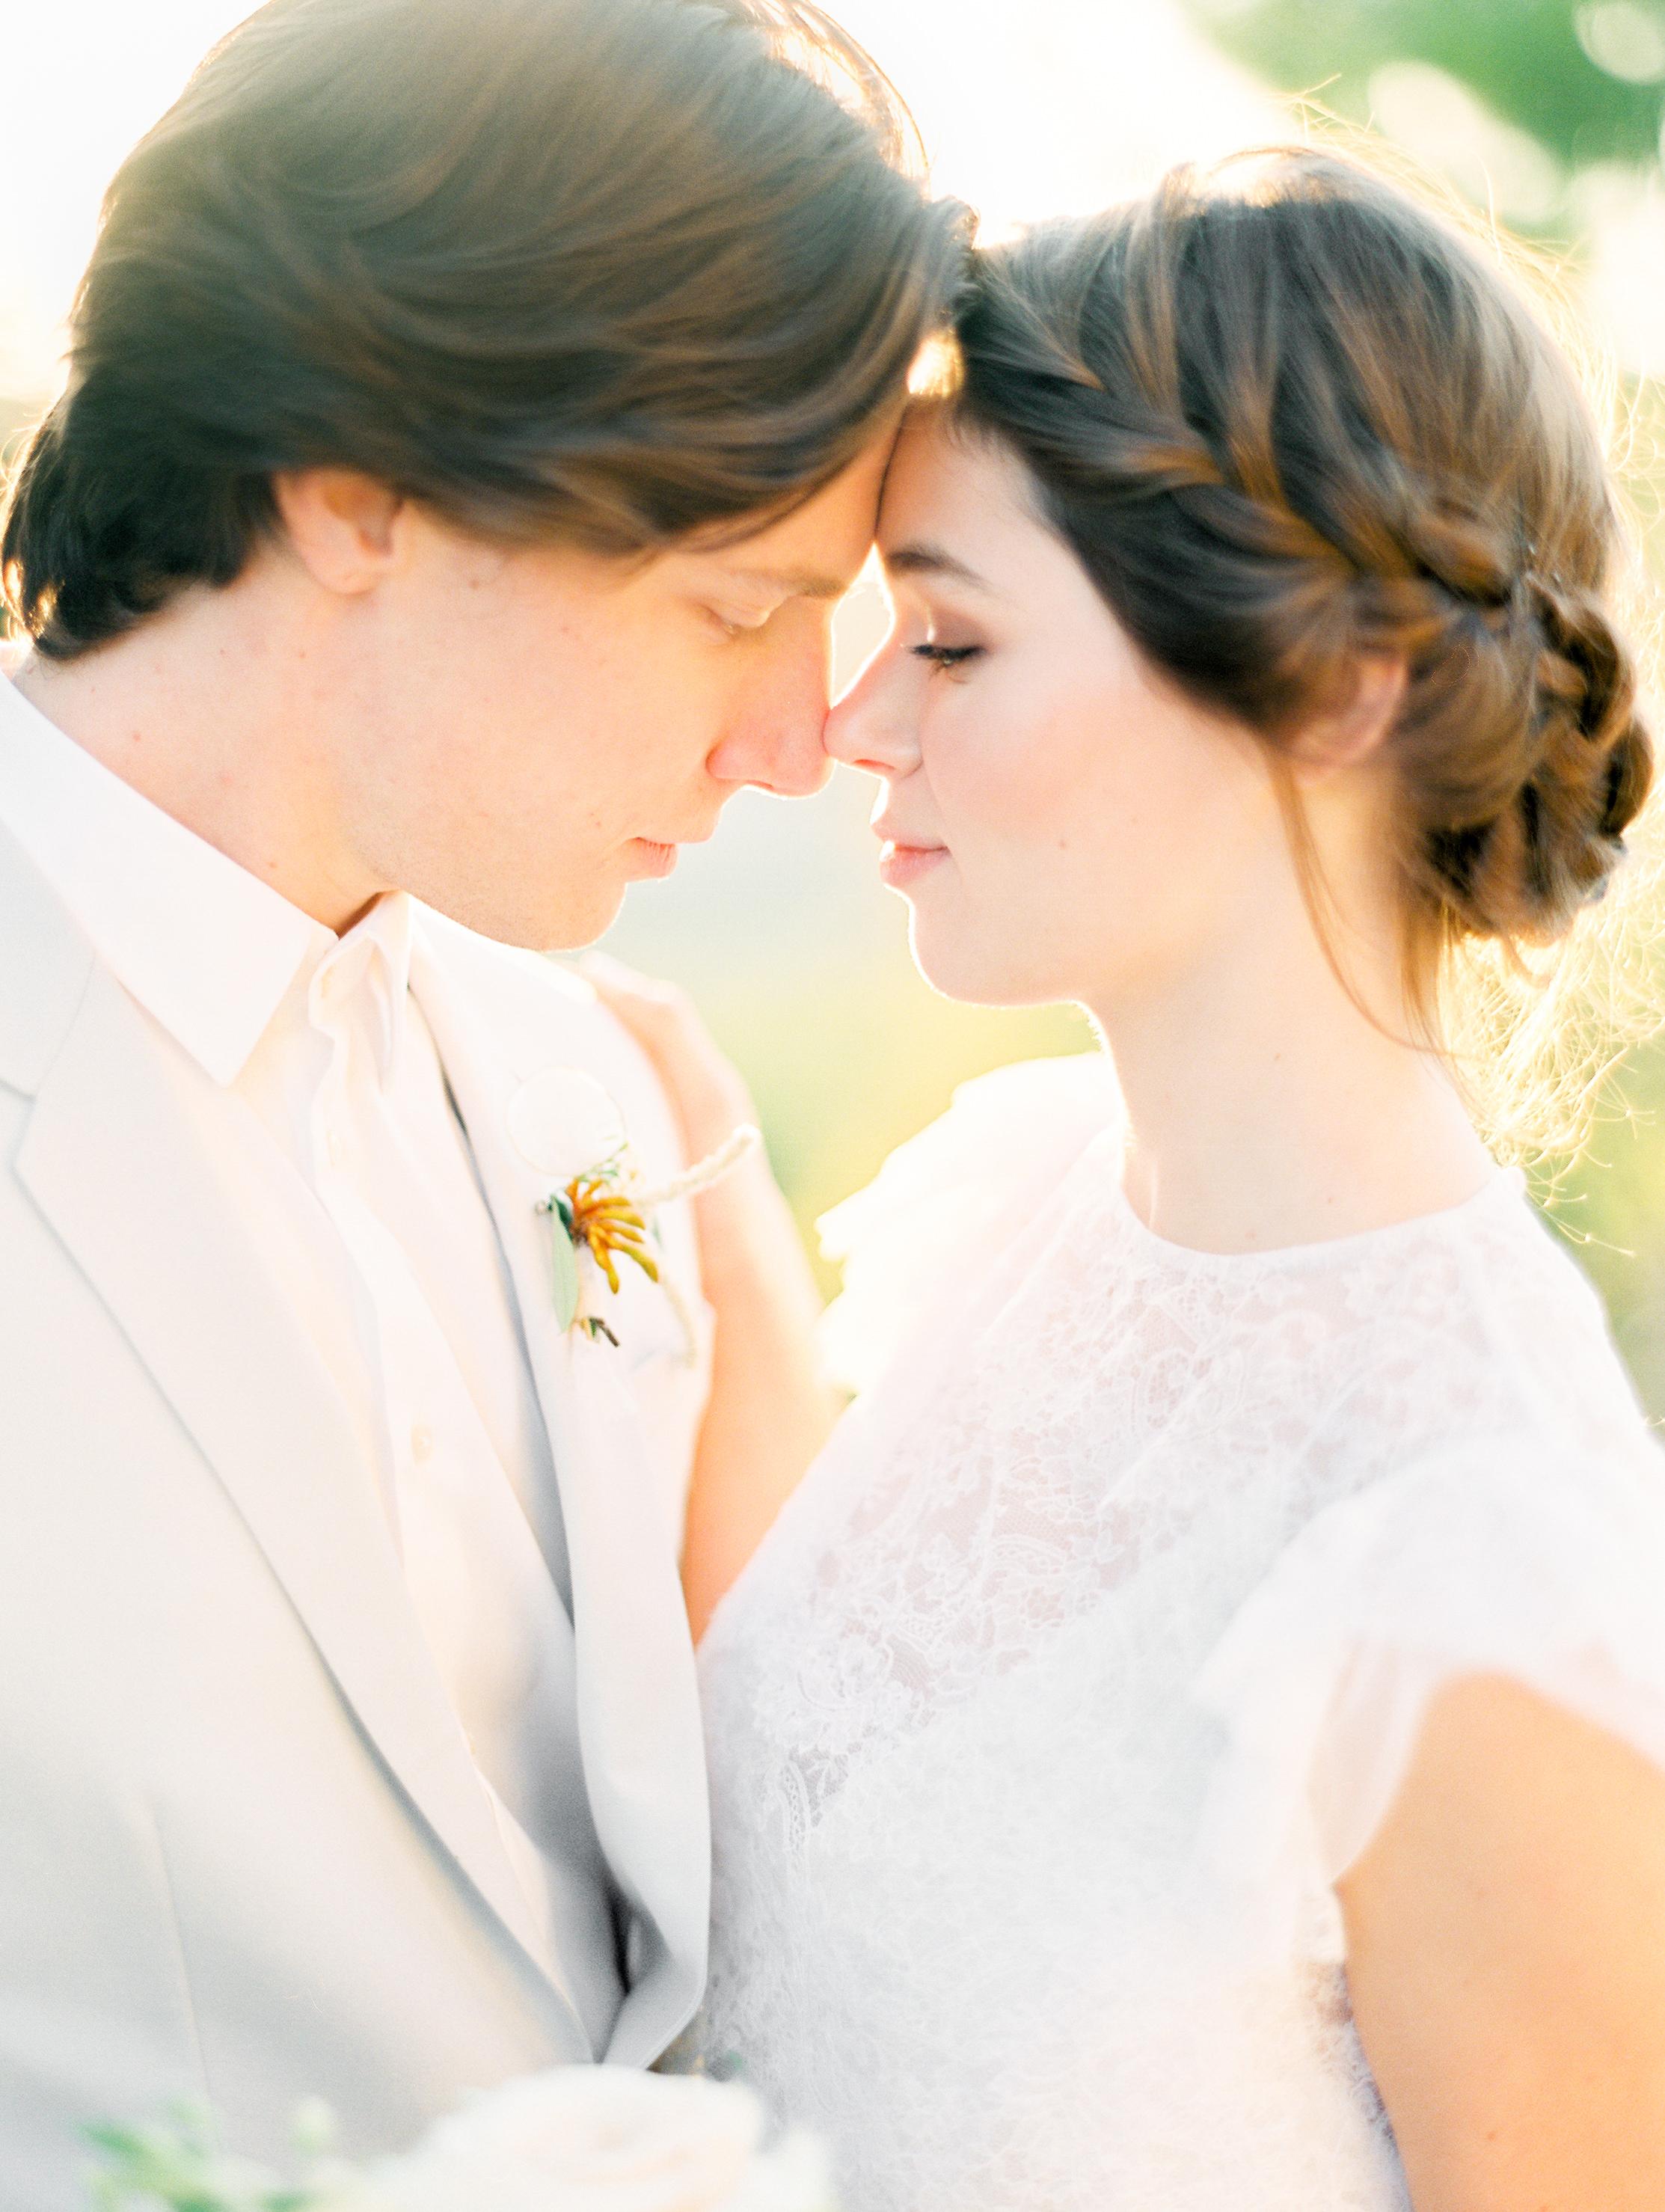 romantic-italy-wedding-in-tuscany-133.jpg